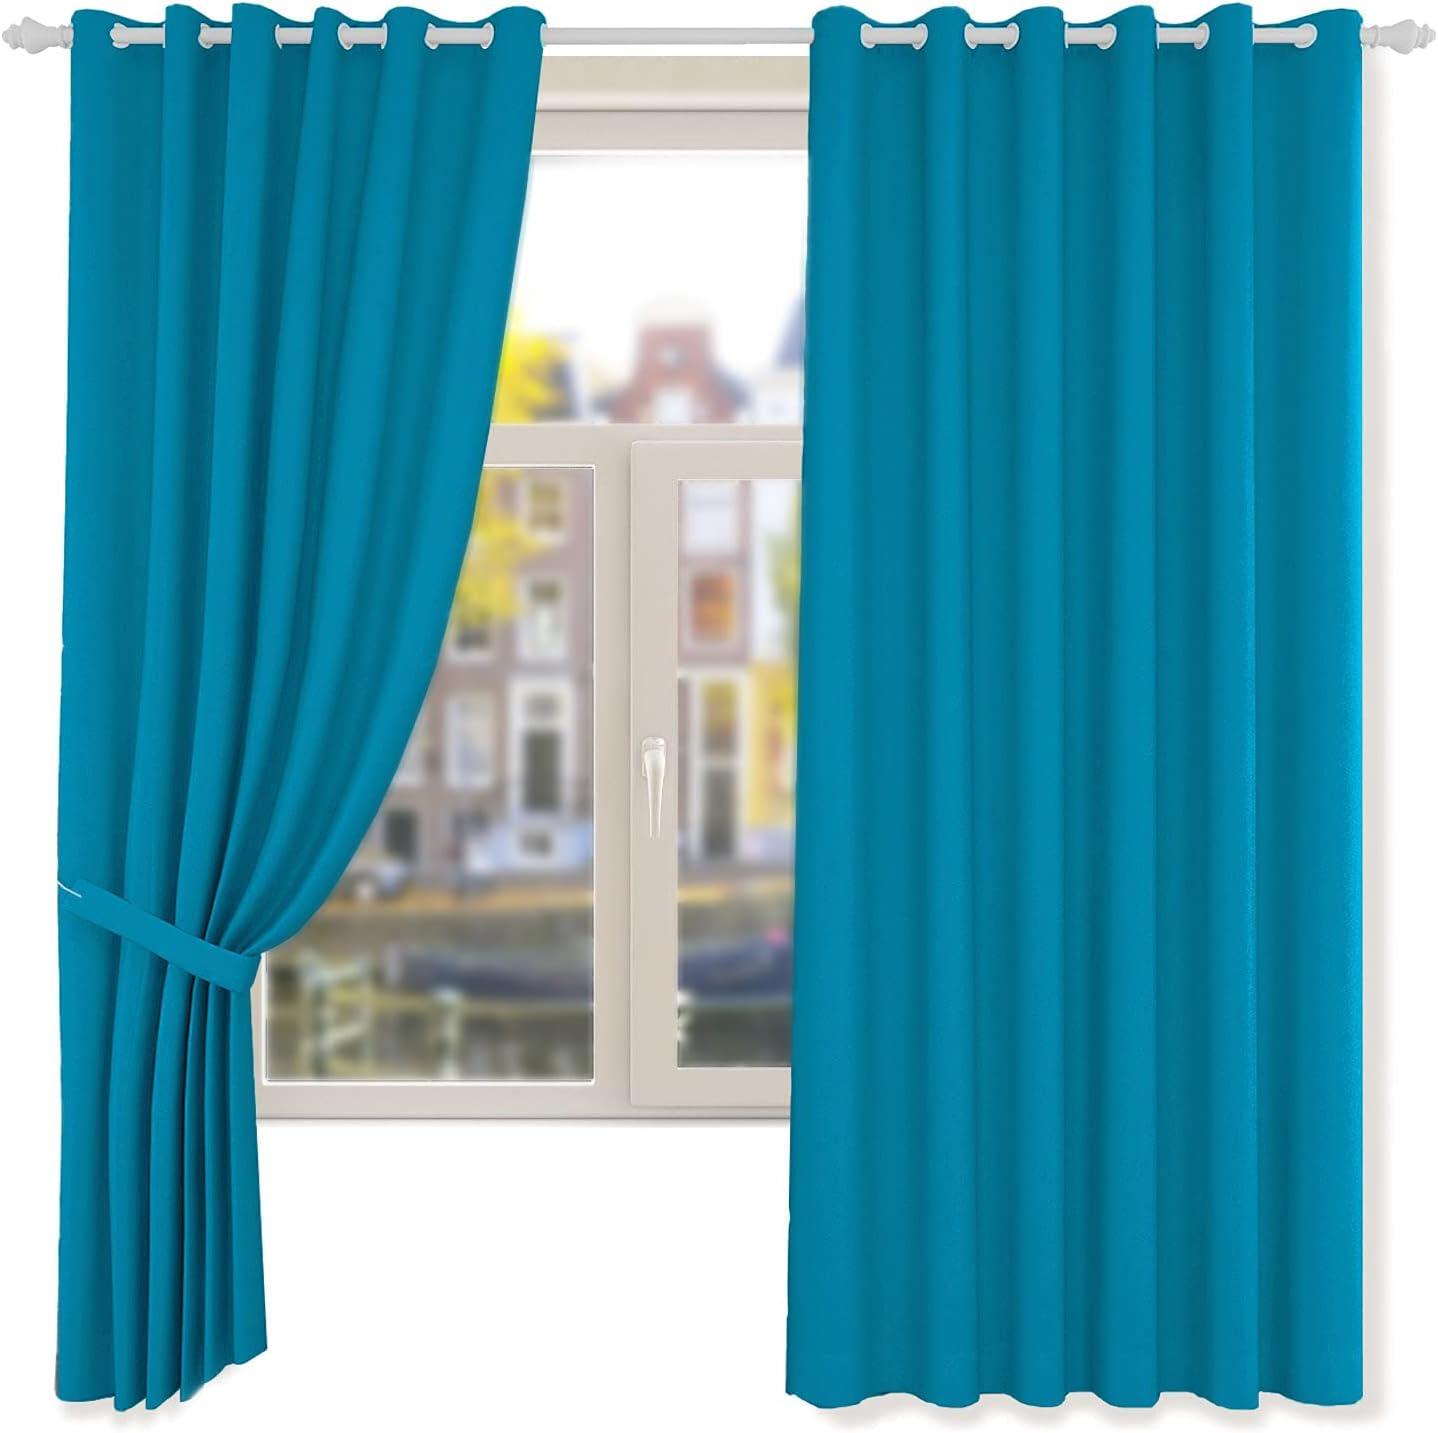 ANUWAA Blackout 奉呈 Curtains セール 特集 63 inch Length Ou Linen Black 2 Panels